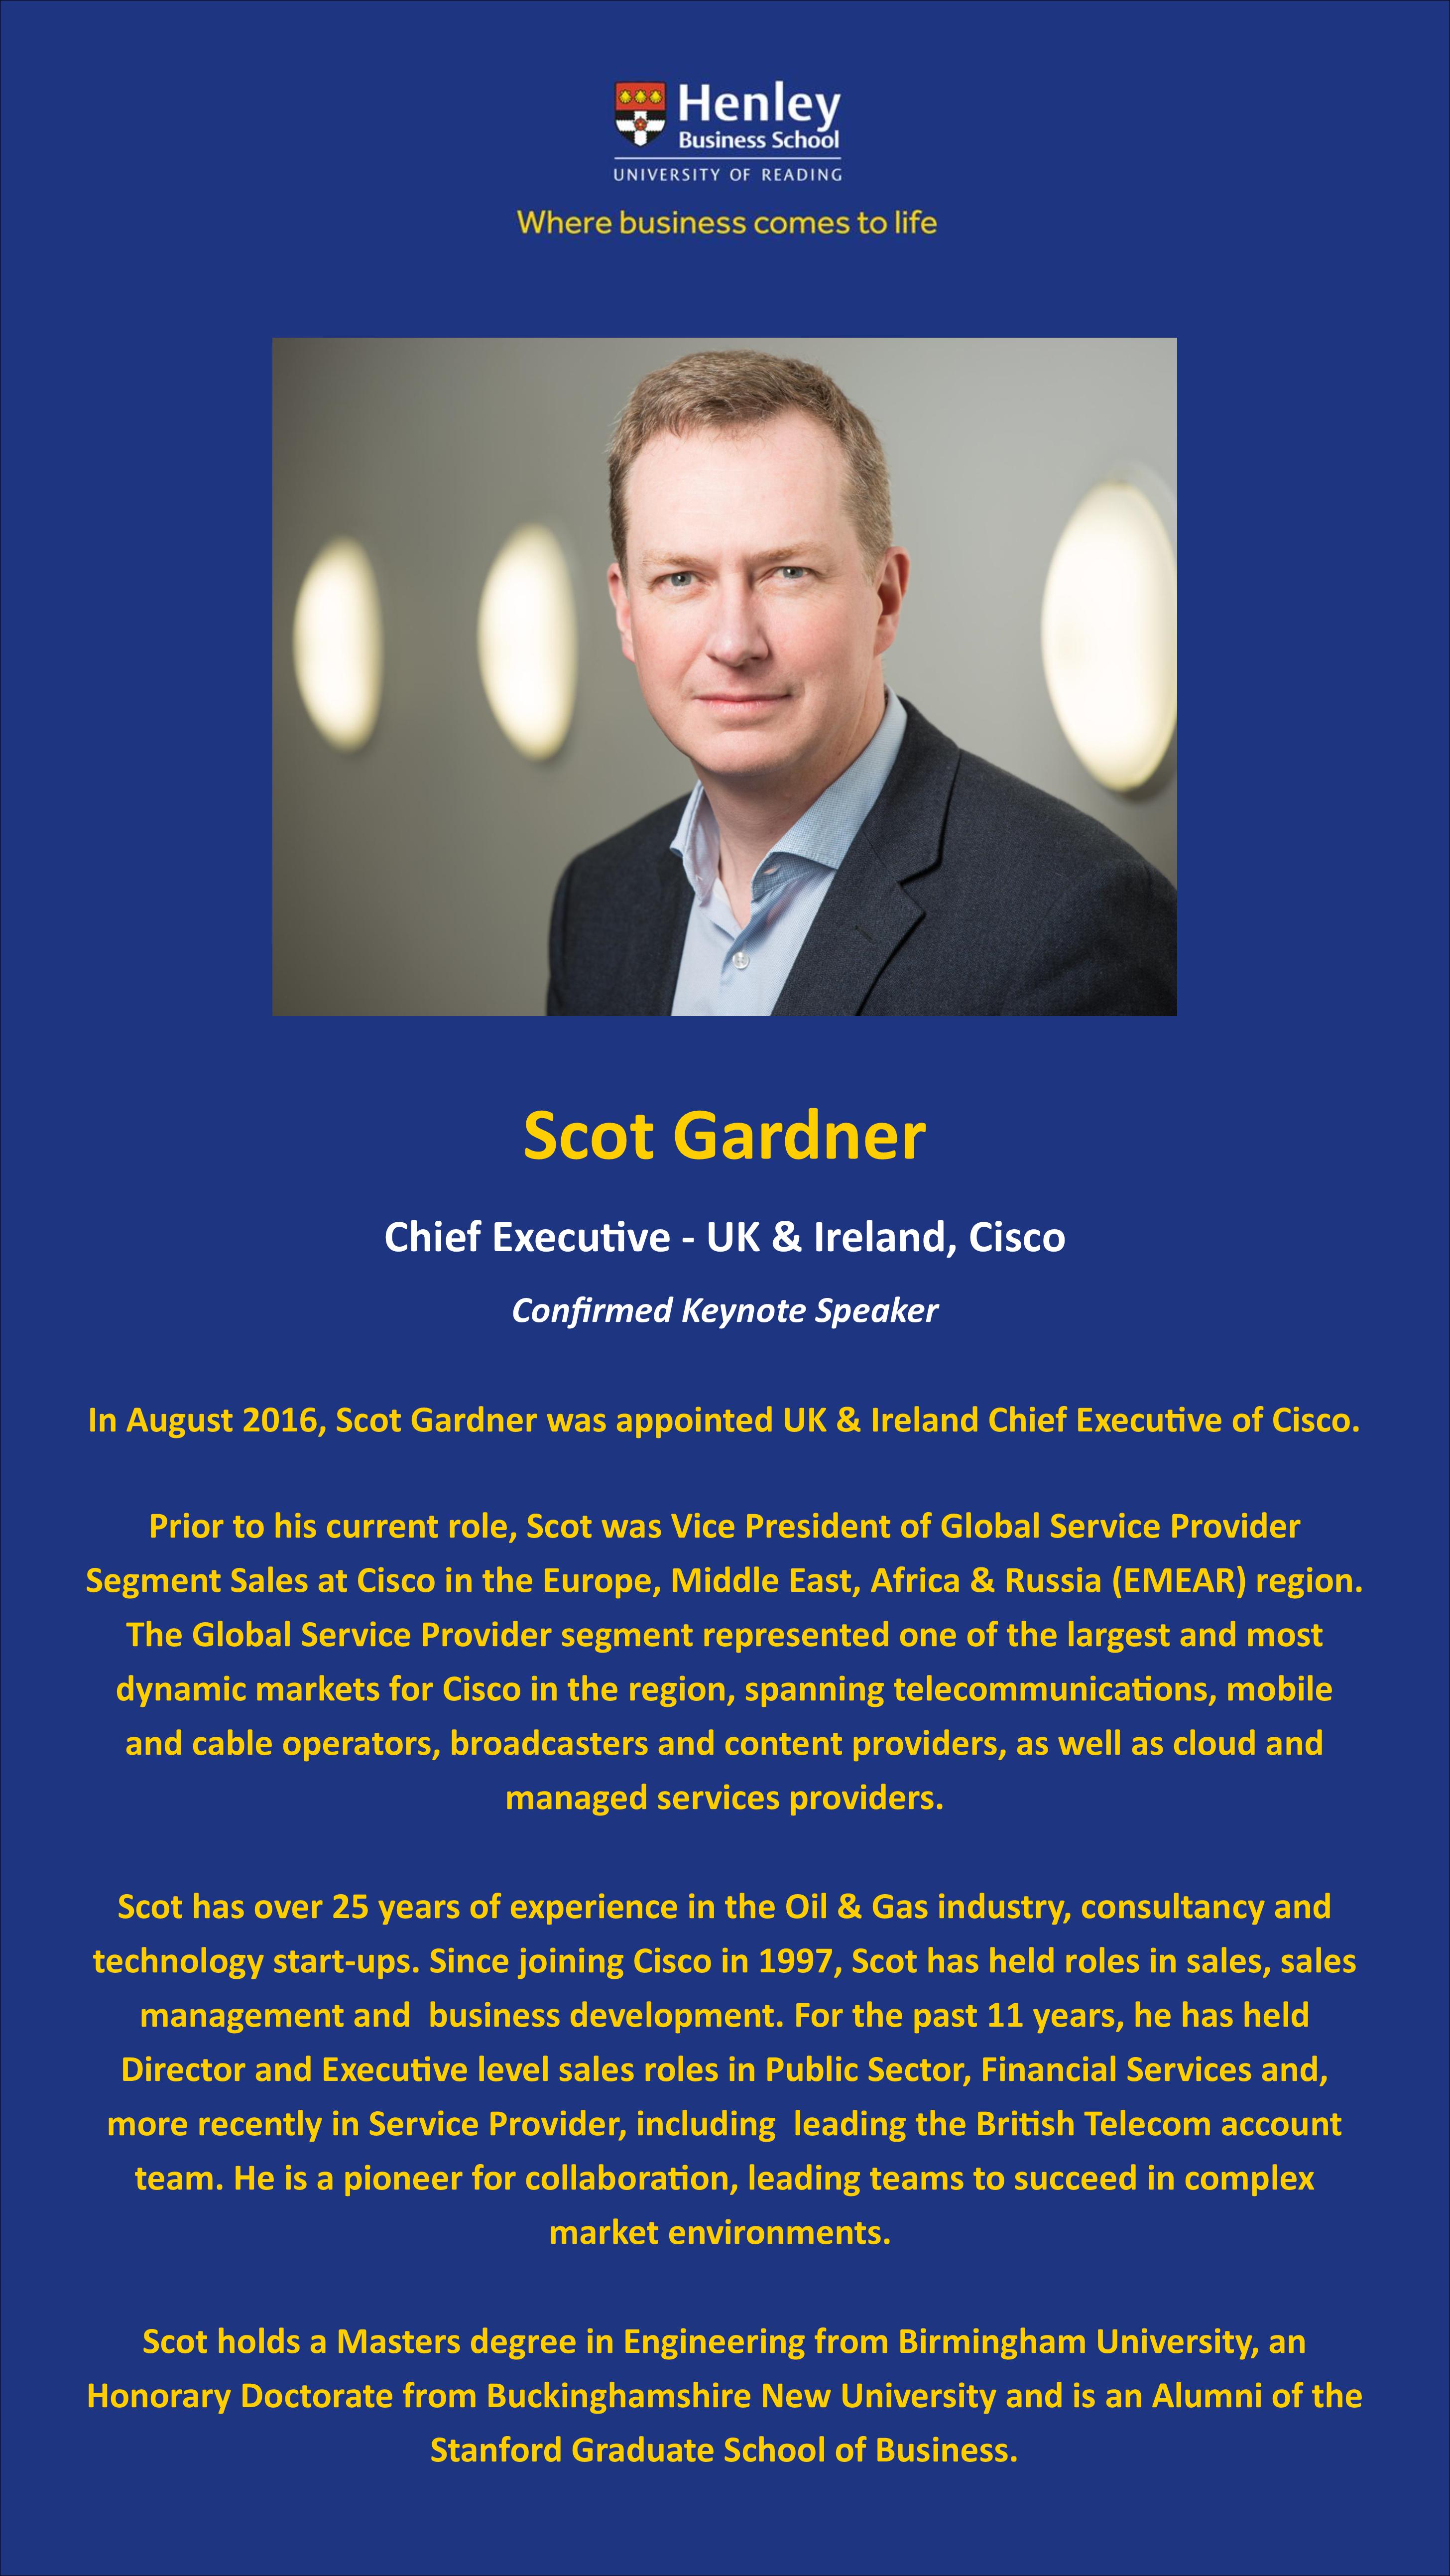 Scot Gardner Bio